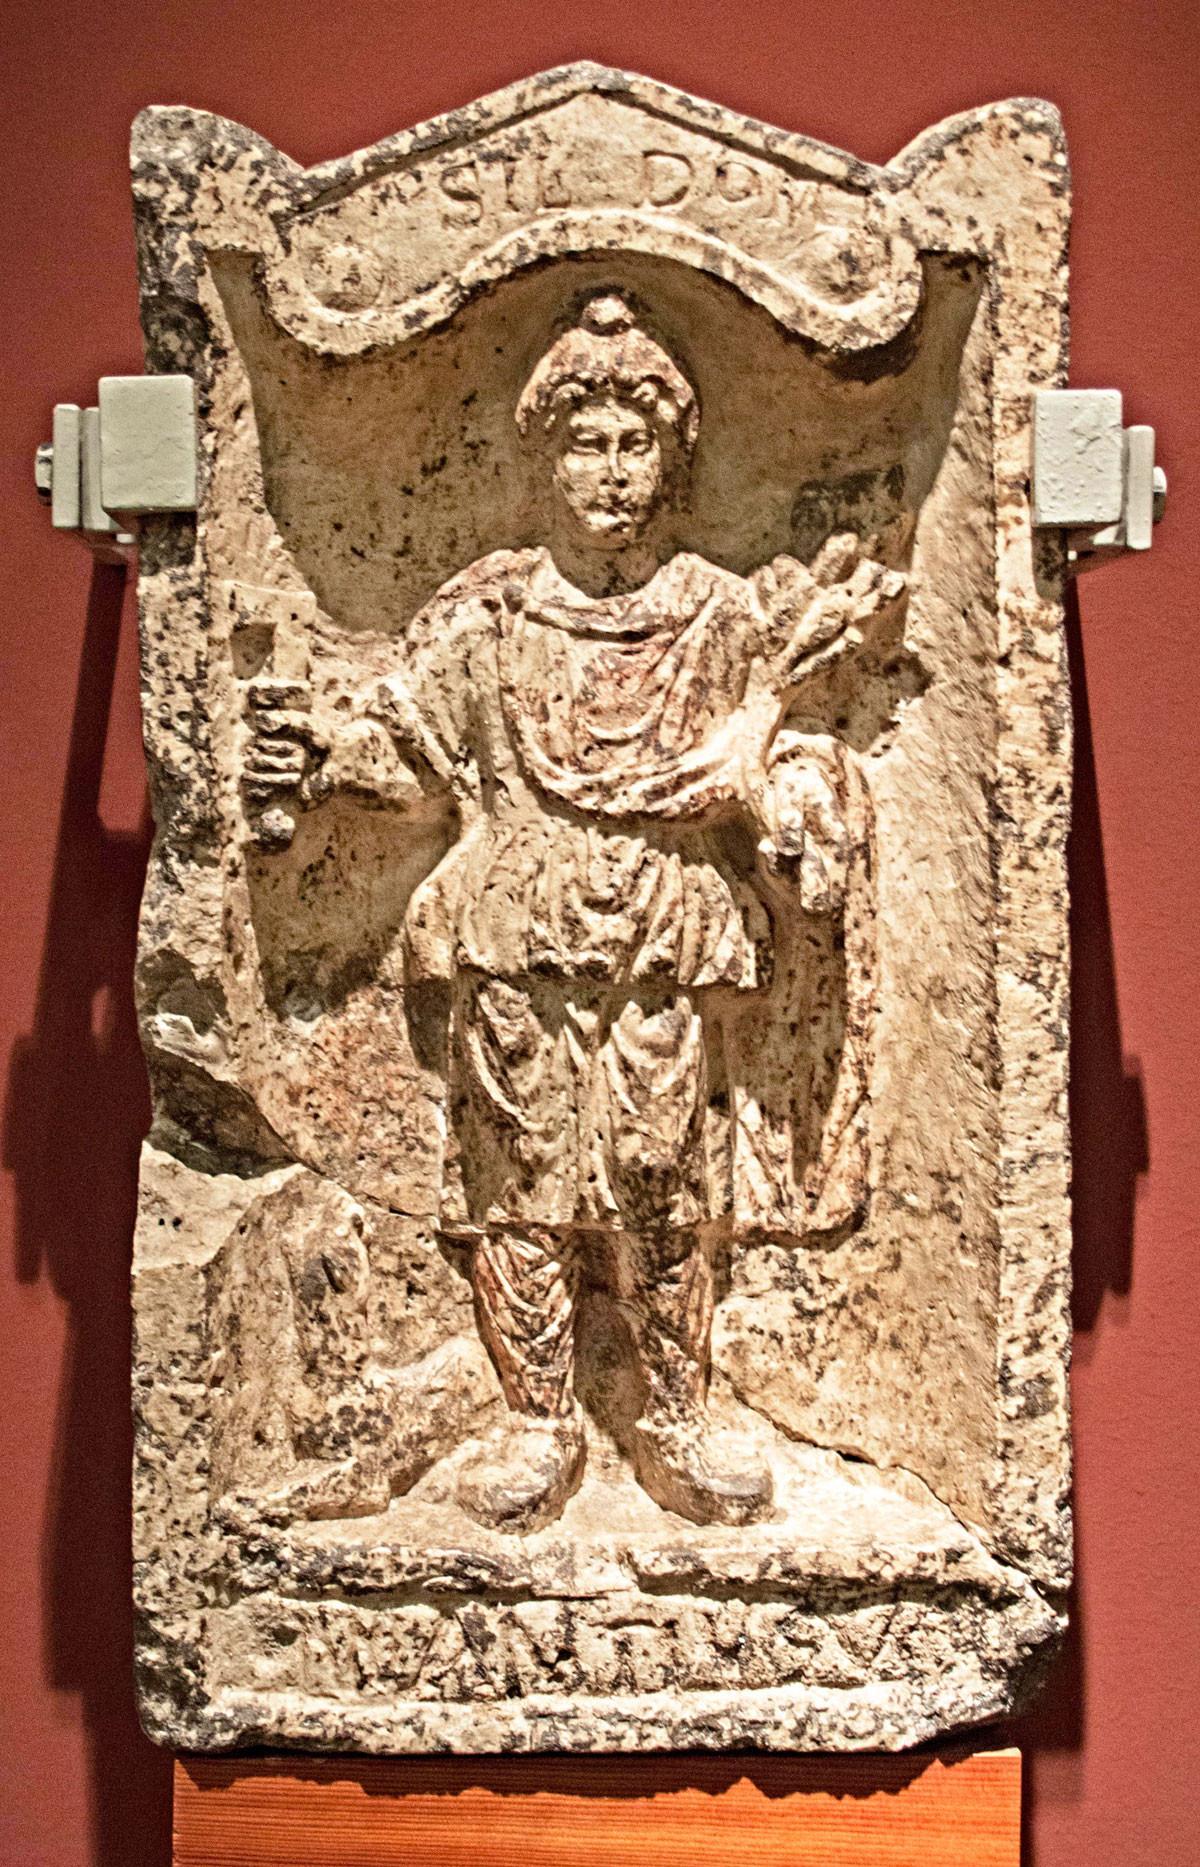 Fogadalmi ajándék Silvanusnak Aquincumból